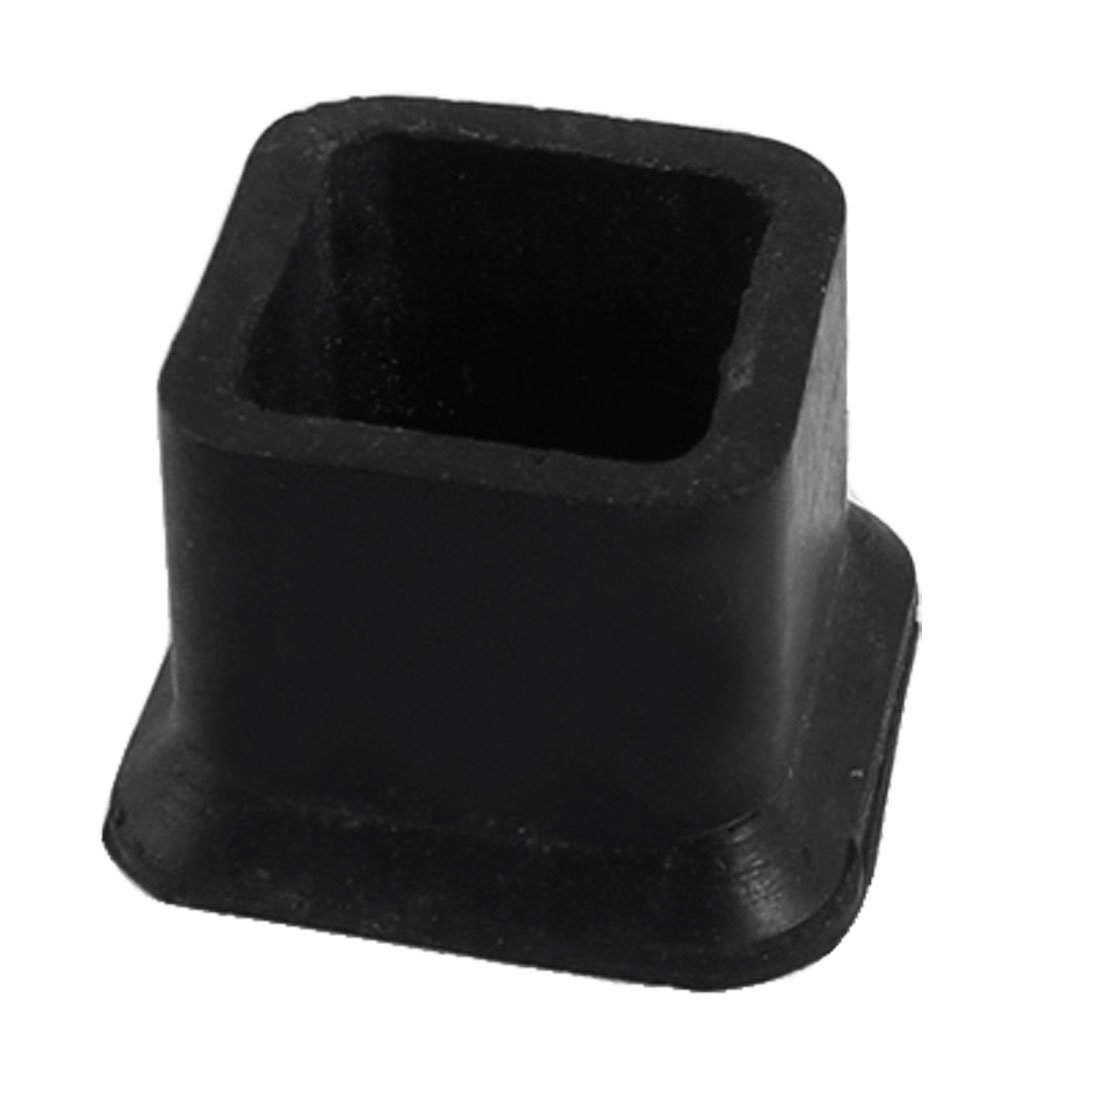 Flyshop Square Anti-Slip Rubber Leg Tips Covers Furniture Protectors 0.98 Inch x 0.98 Inch Black 10Pcs